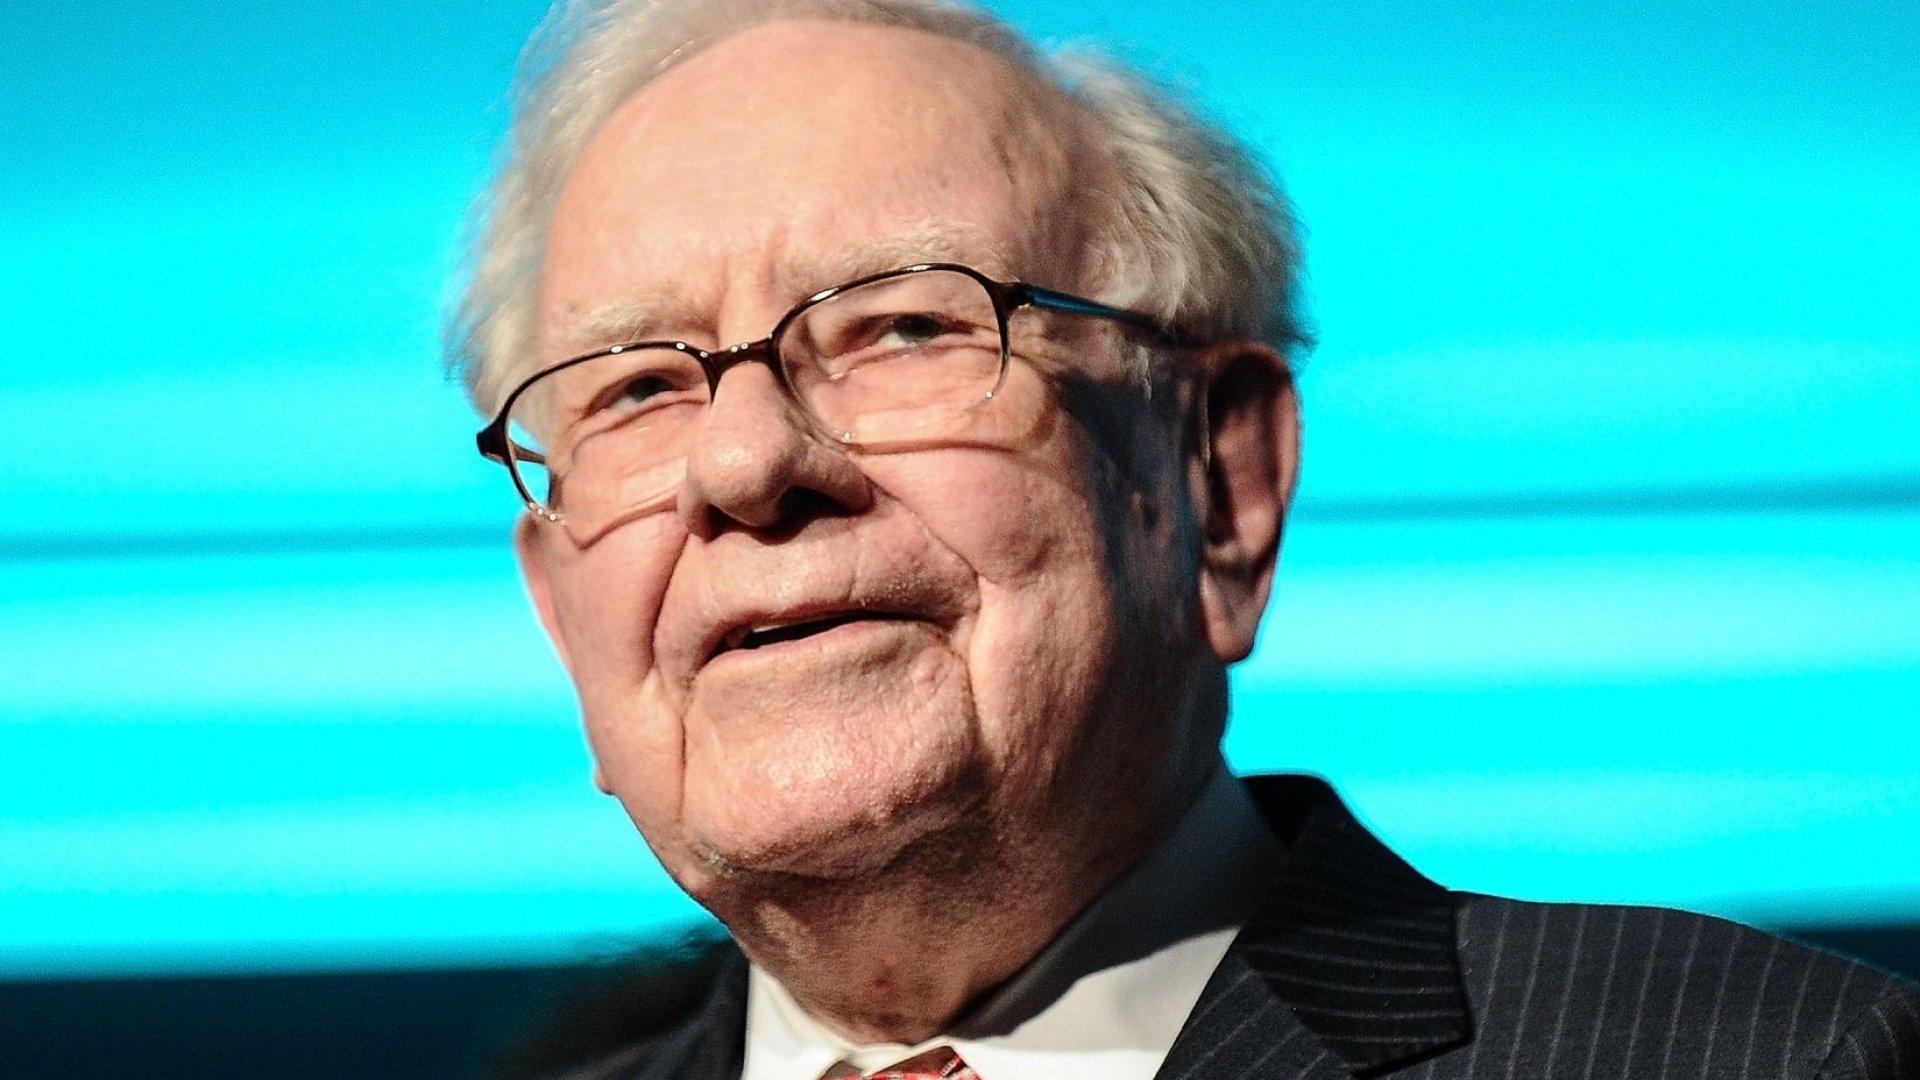 Warren Buffett speaks during the Forbes' 2015 Philanthropy Summit Awards Dinner in New York City.